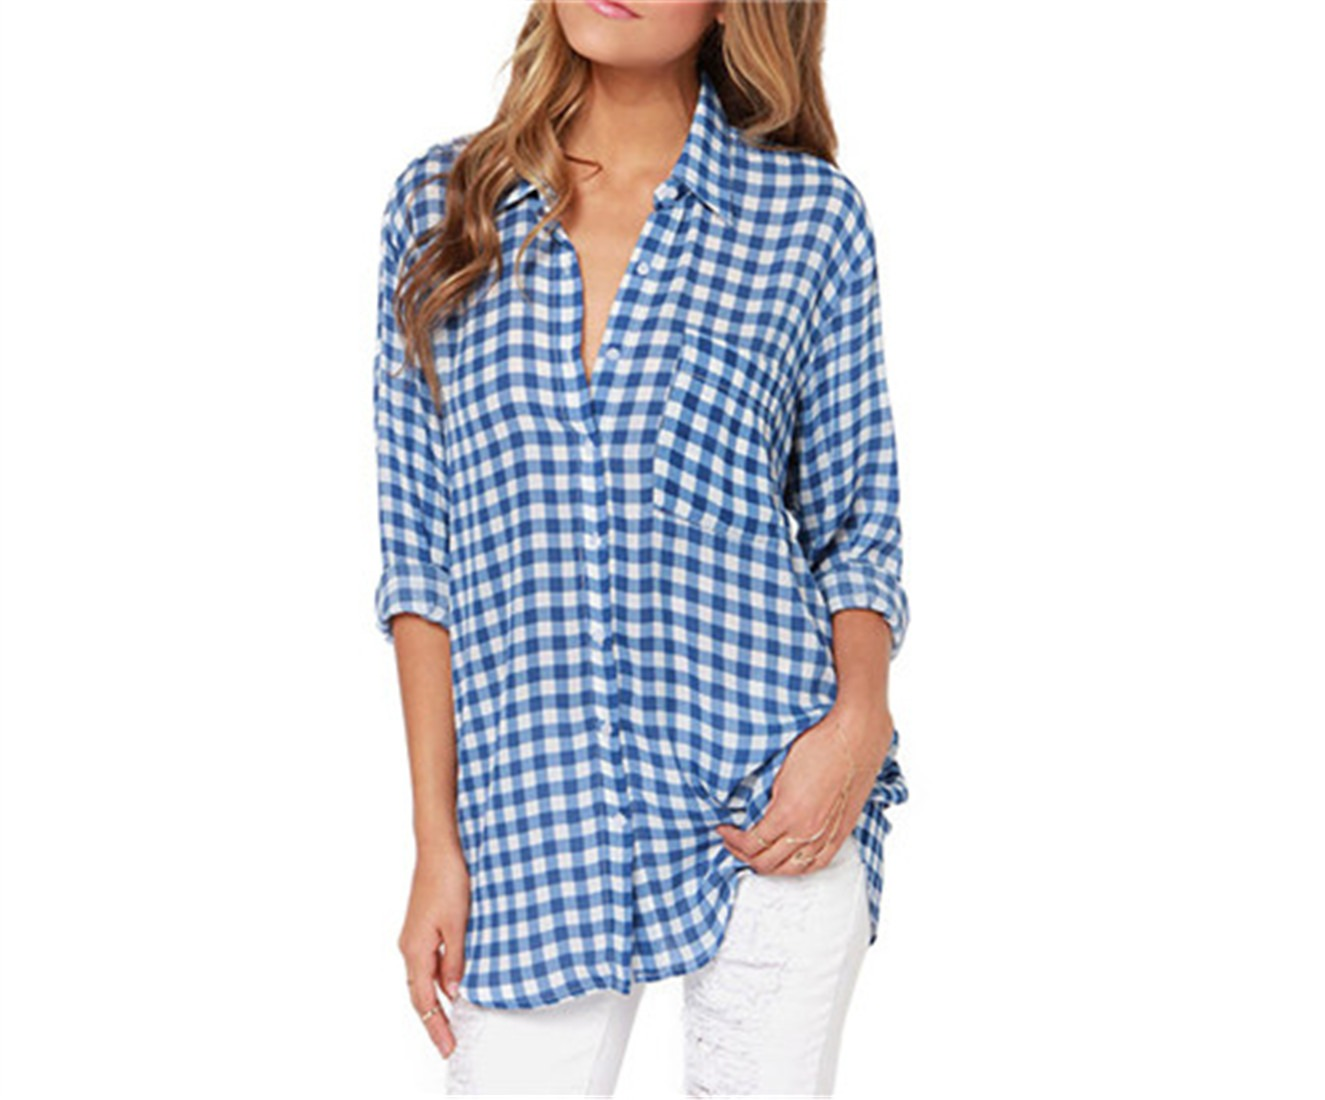 Blue White Checks Plaid Basic Long Sleeve Chiffon Tops Blouses casual Shirt new